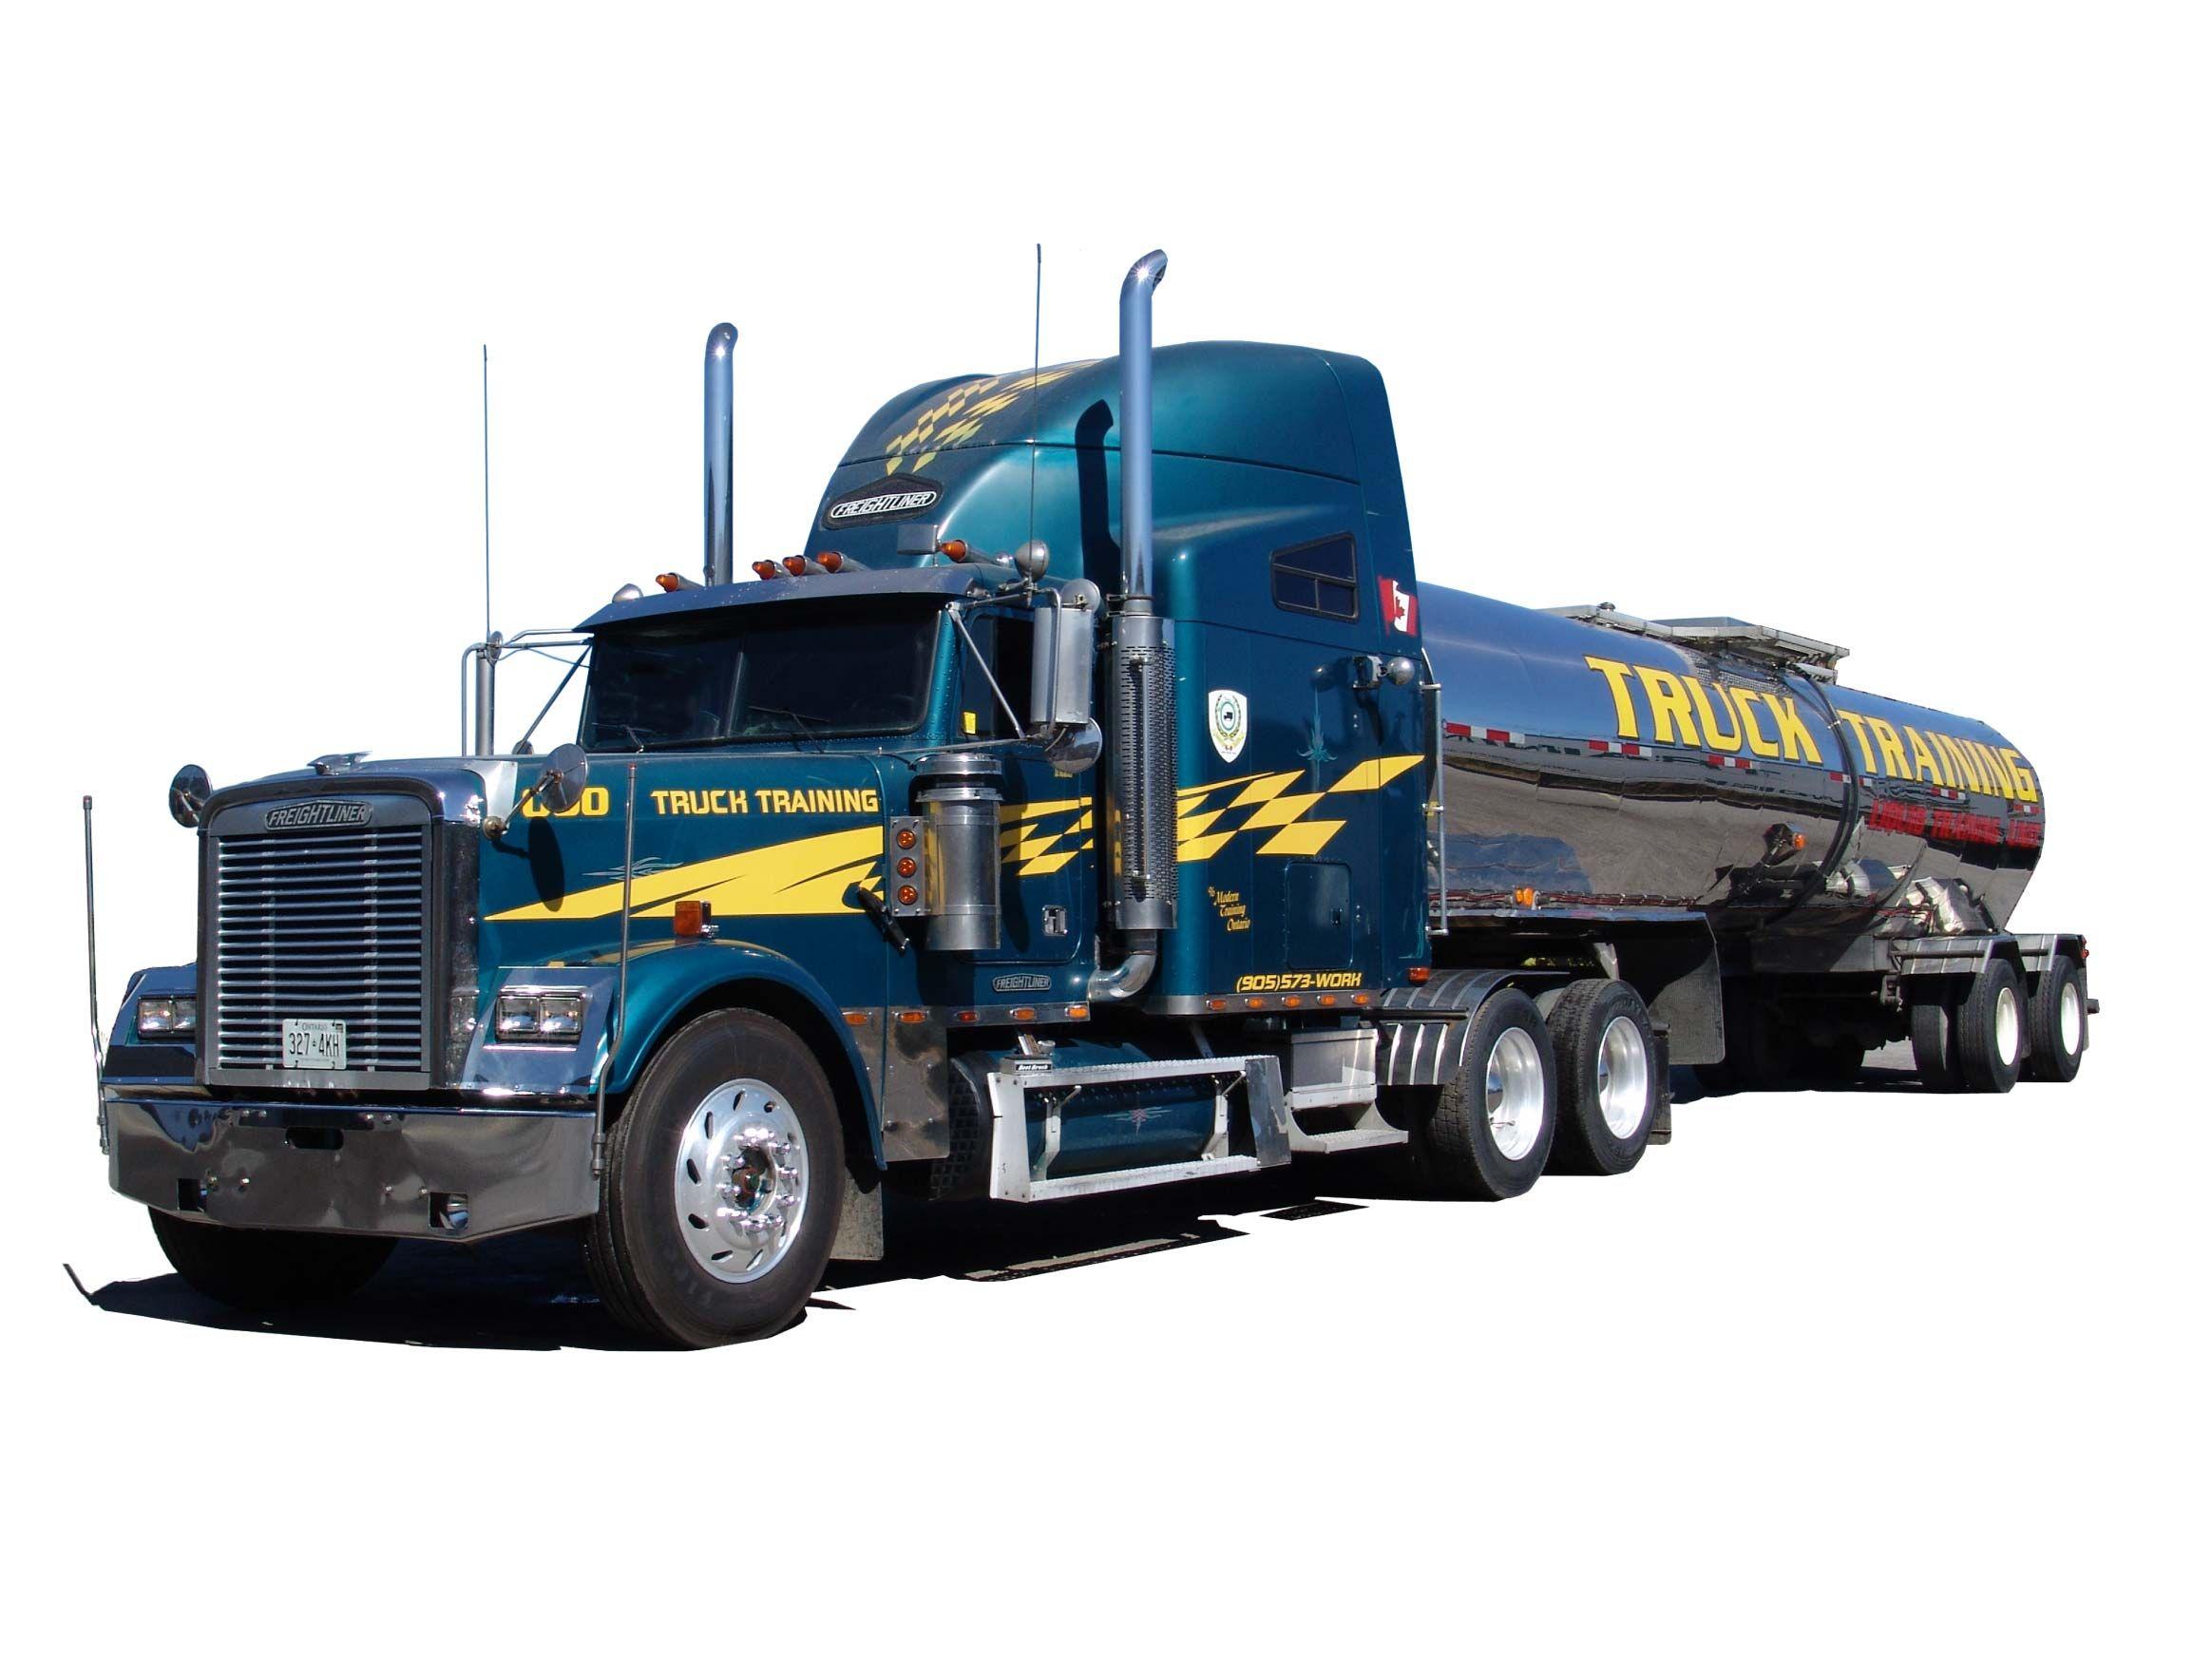 Mack Truck Sales | hhttp://www.truckertotrucker.com/trucking/mack ...